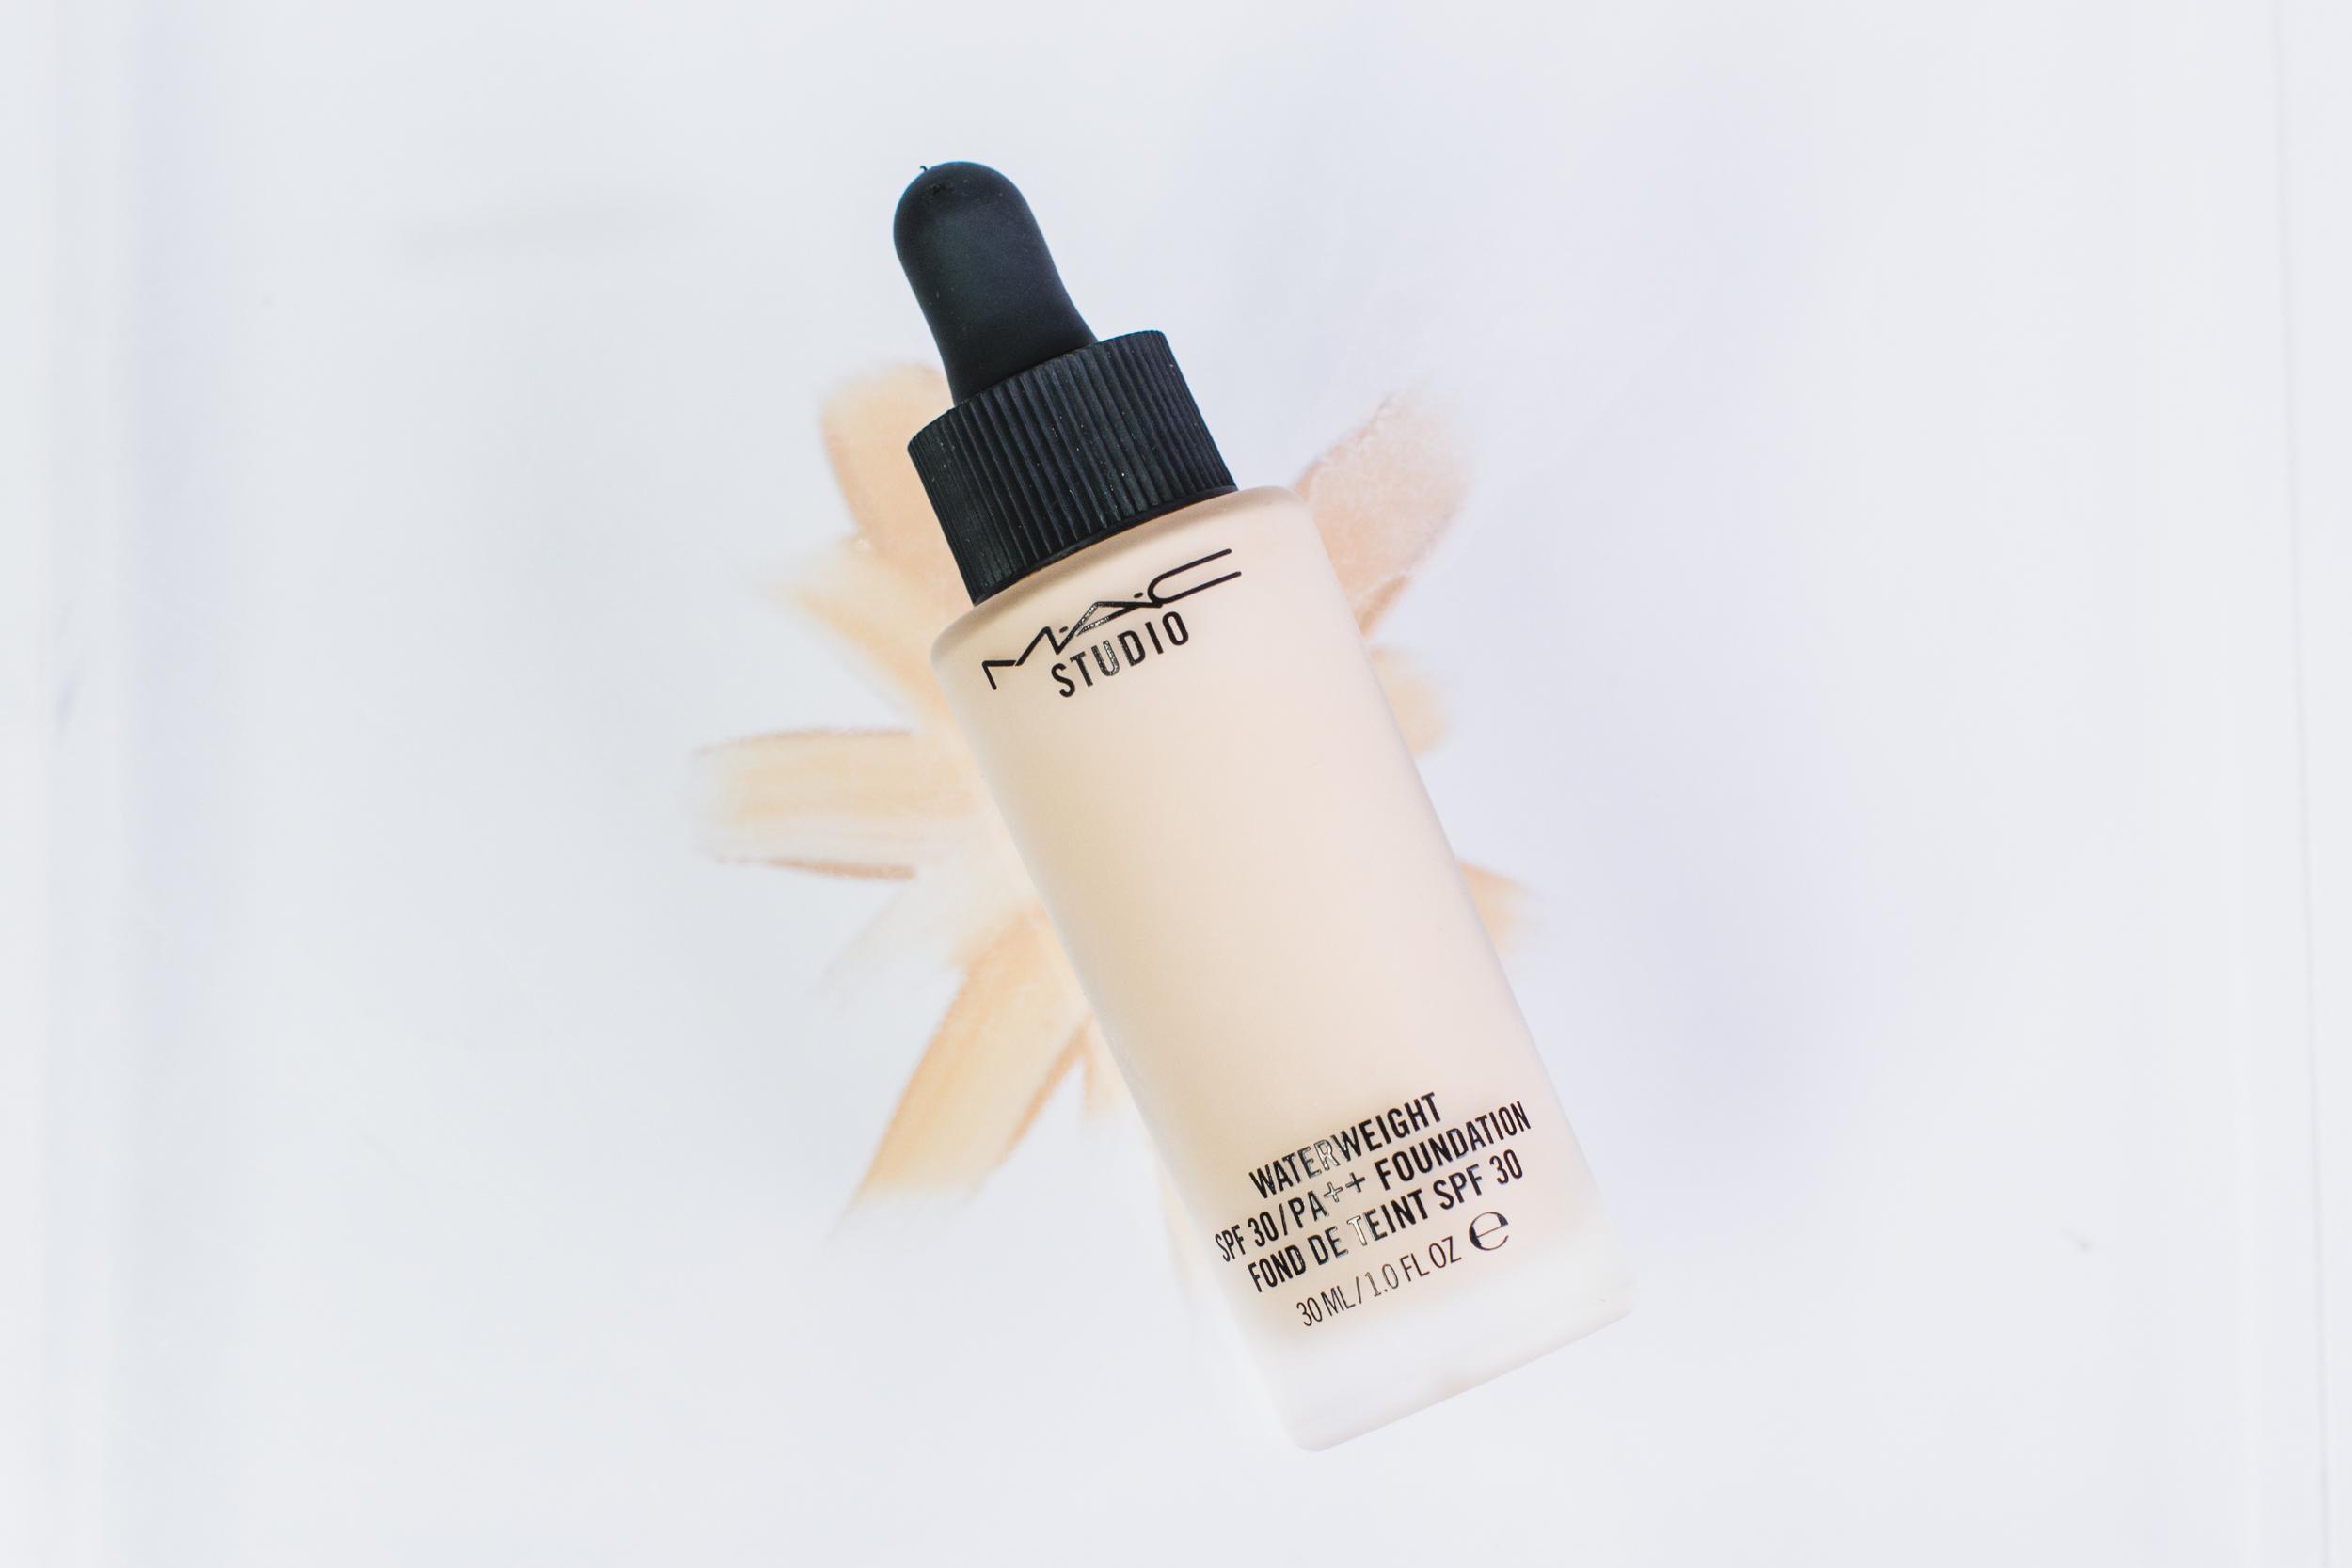 lightweight-foundation_loreal-mac-estee-lauder-revlon-make-up-for-ever_review-philippines_2019-13.JPG